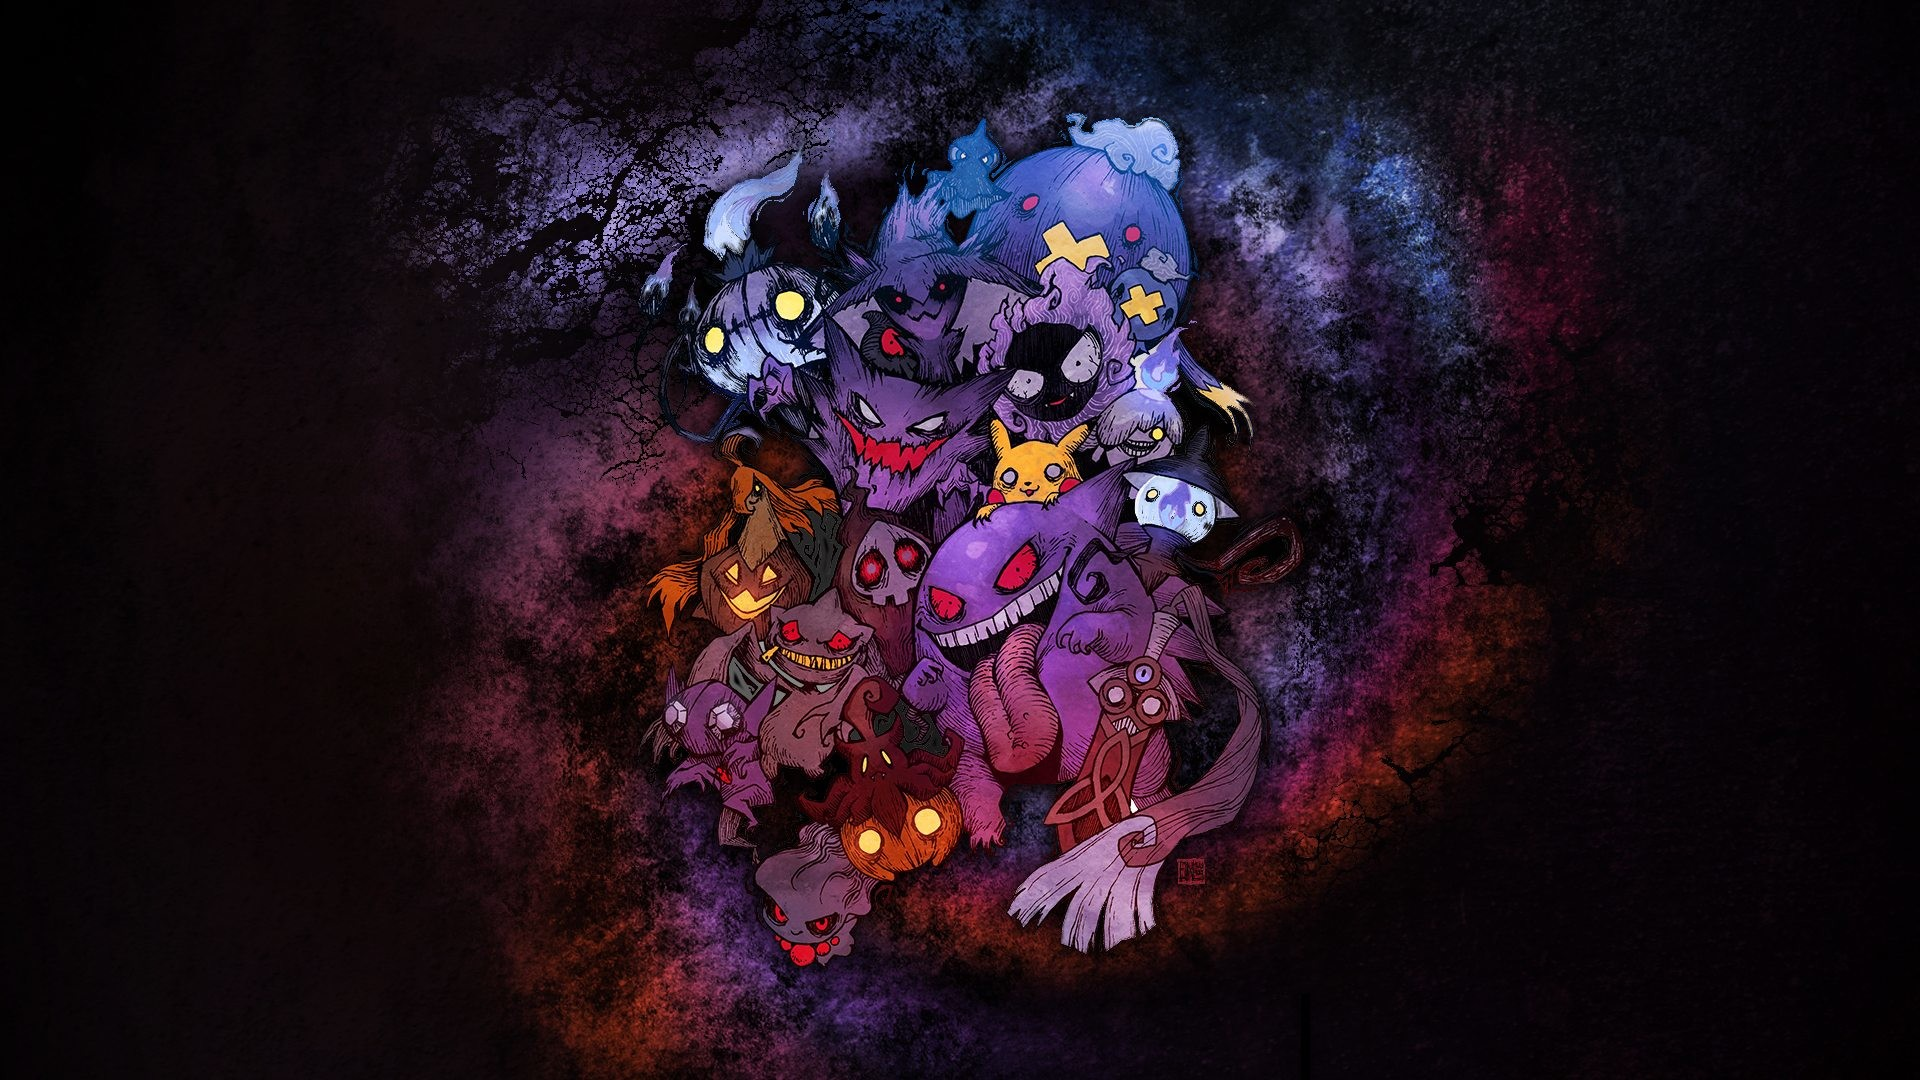 Ghost Pokemon Wallpaper Group | HD Wallpapers | Pinterest | Ghost pokemon,  Pokémon and Wallpaper